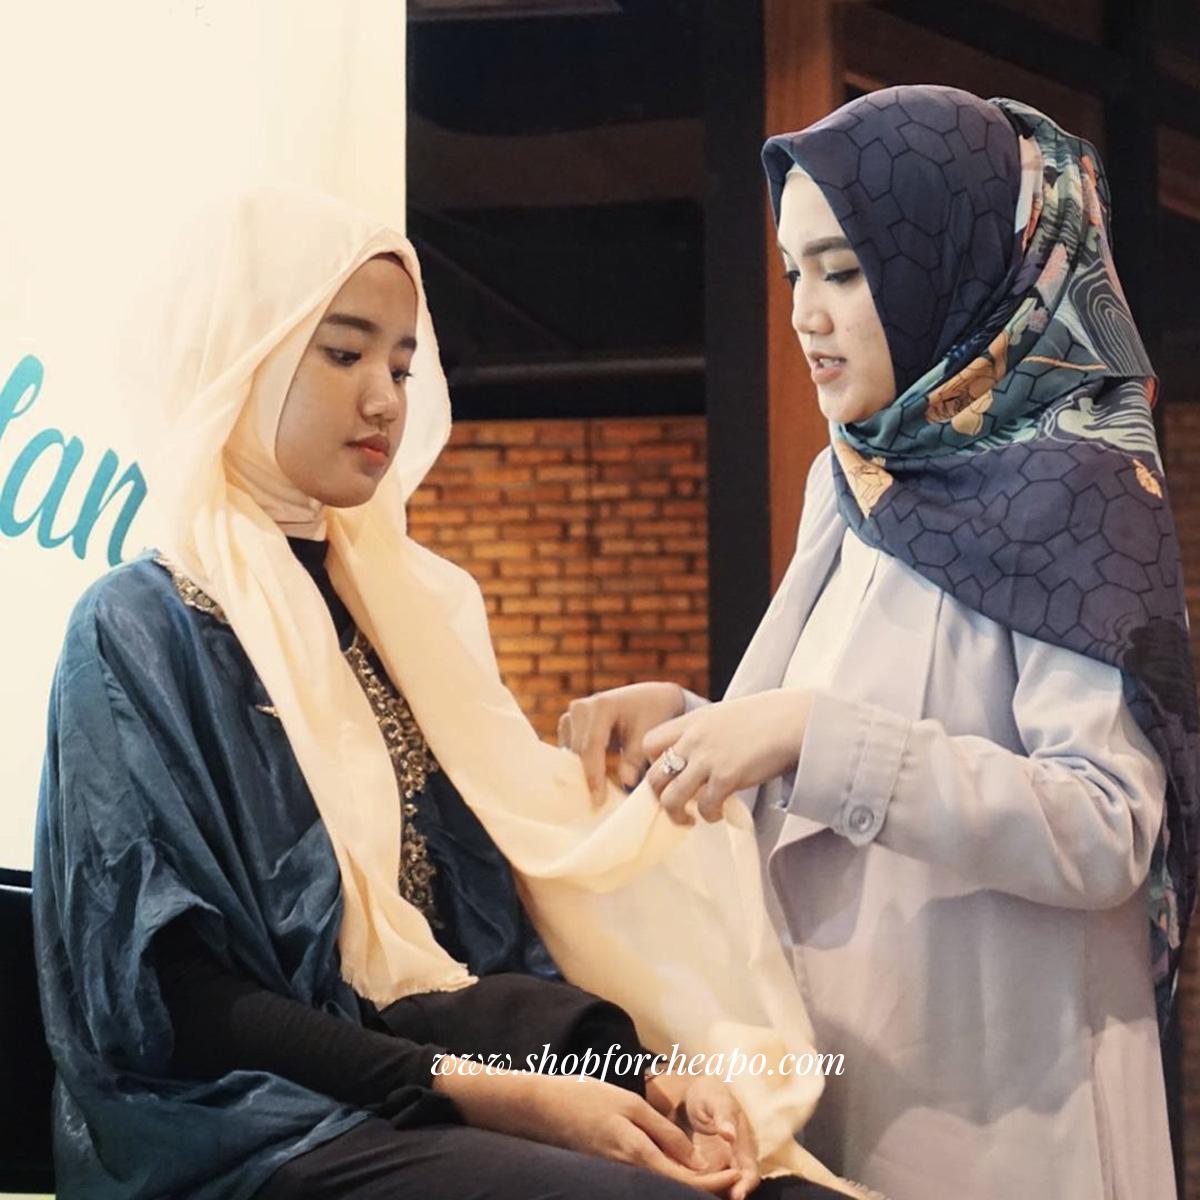 Cerita Sarjana Ekonomi yang Banting Setir Menjadi editor Beauty & Fashion (Hobi Menjadi Karir)